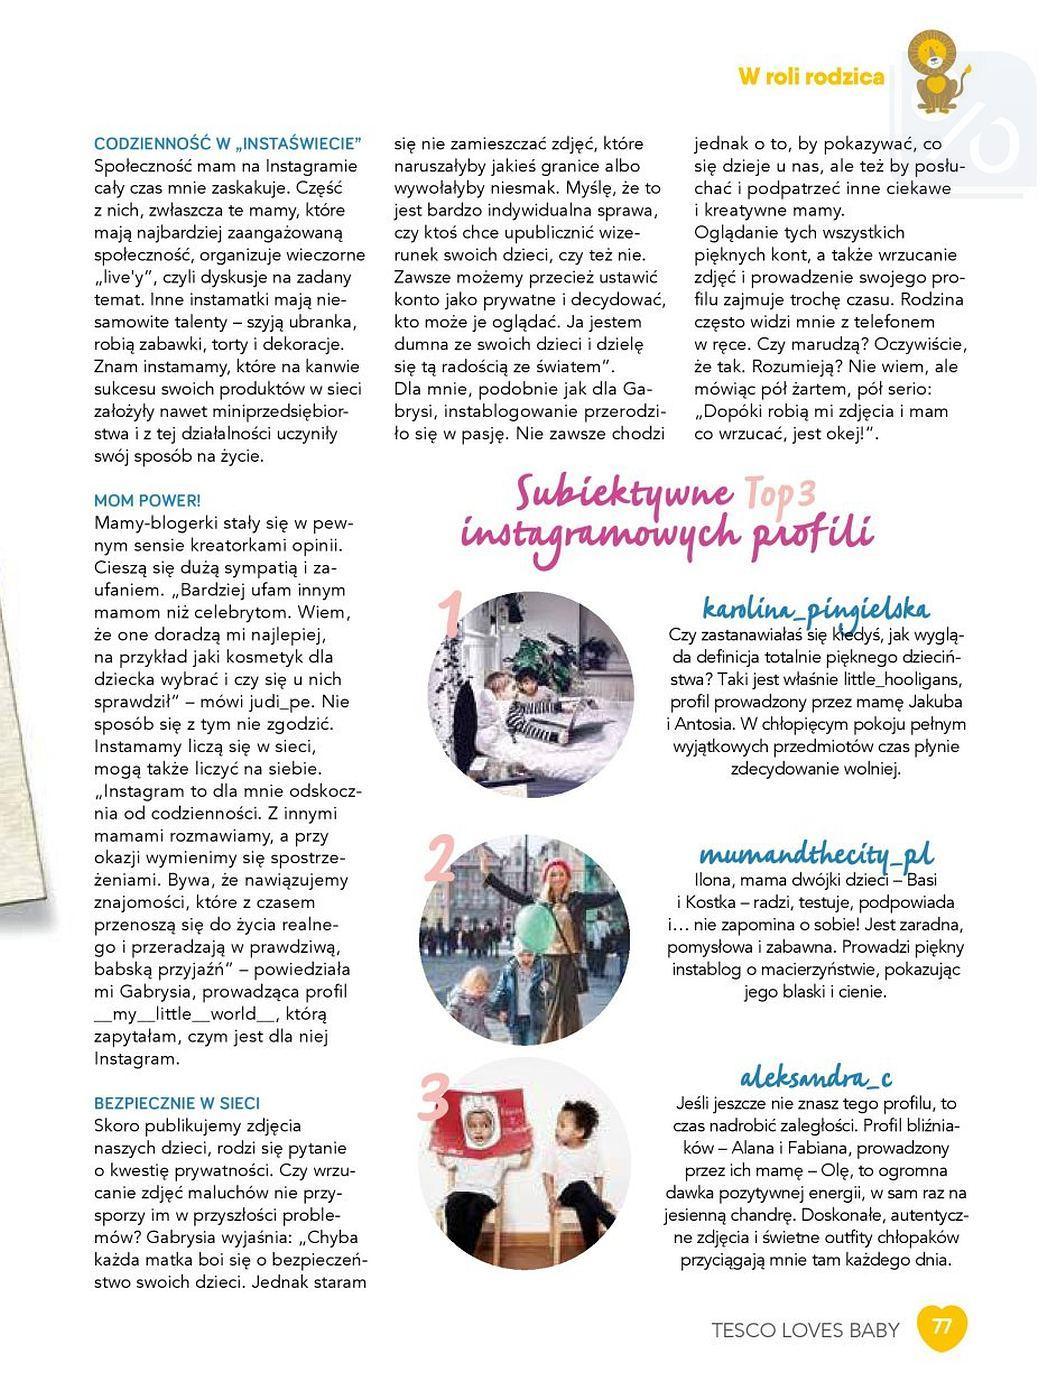 Gazetka promocyjna Tesco do 31/10/2018 str.77